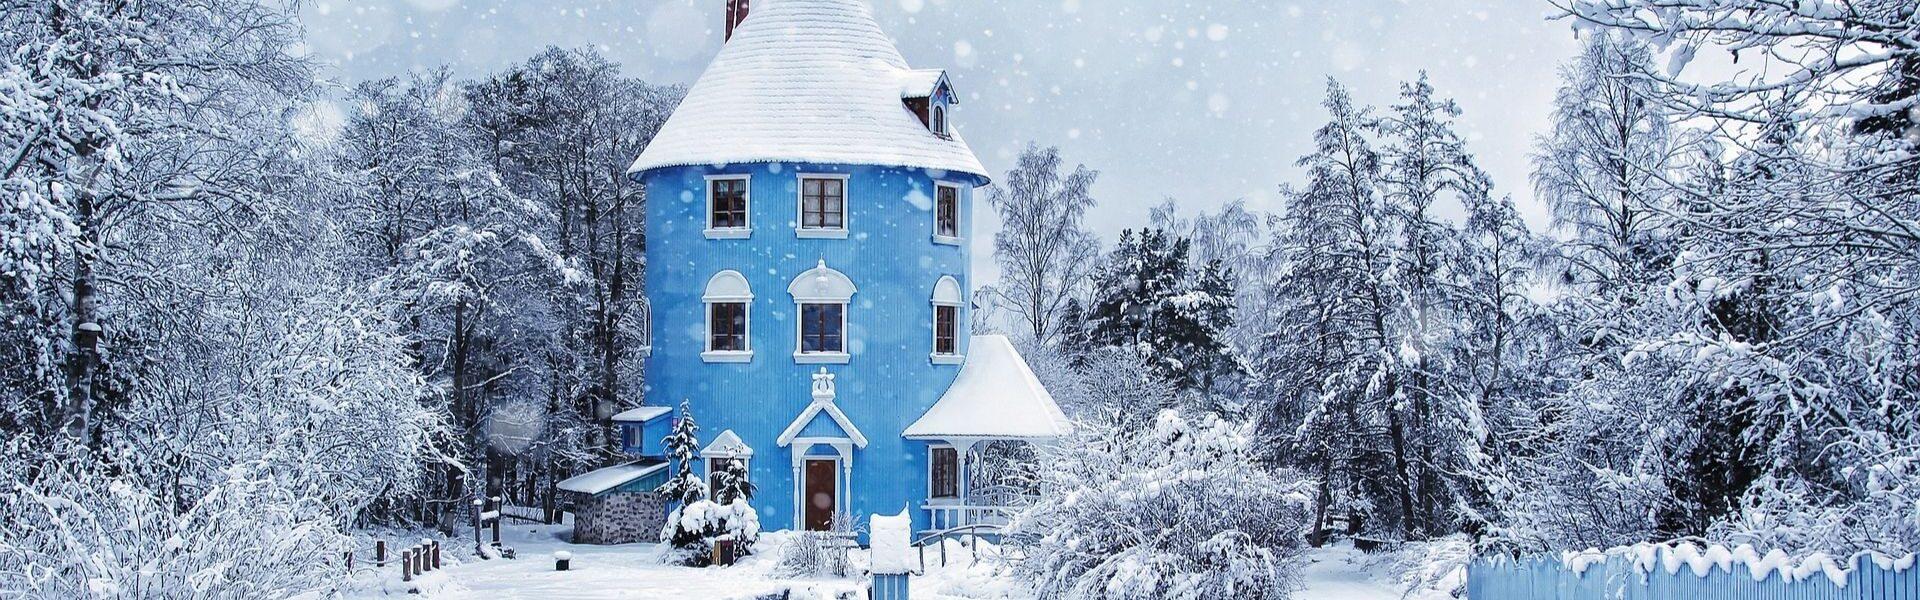 Muumide maja talvel Naantalis